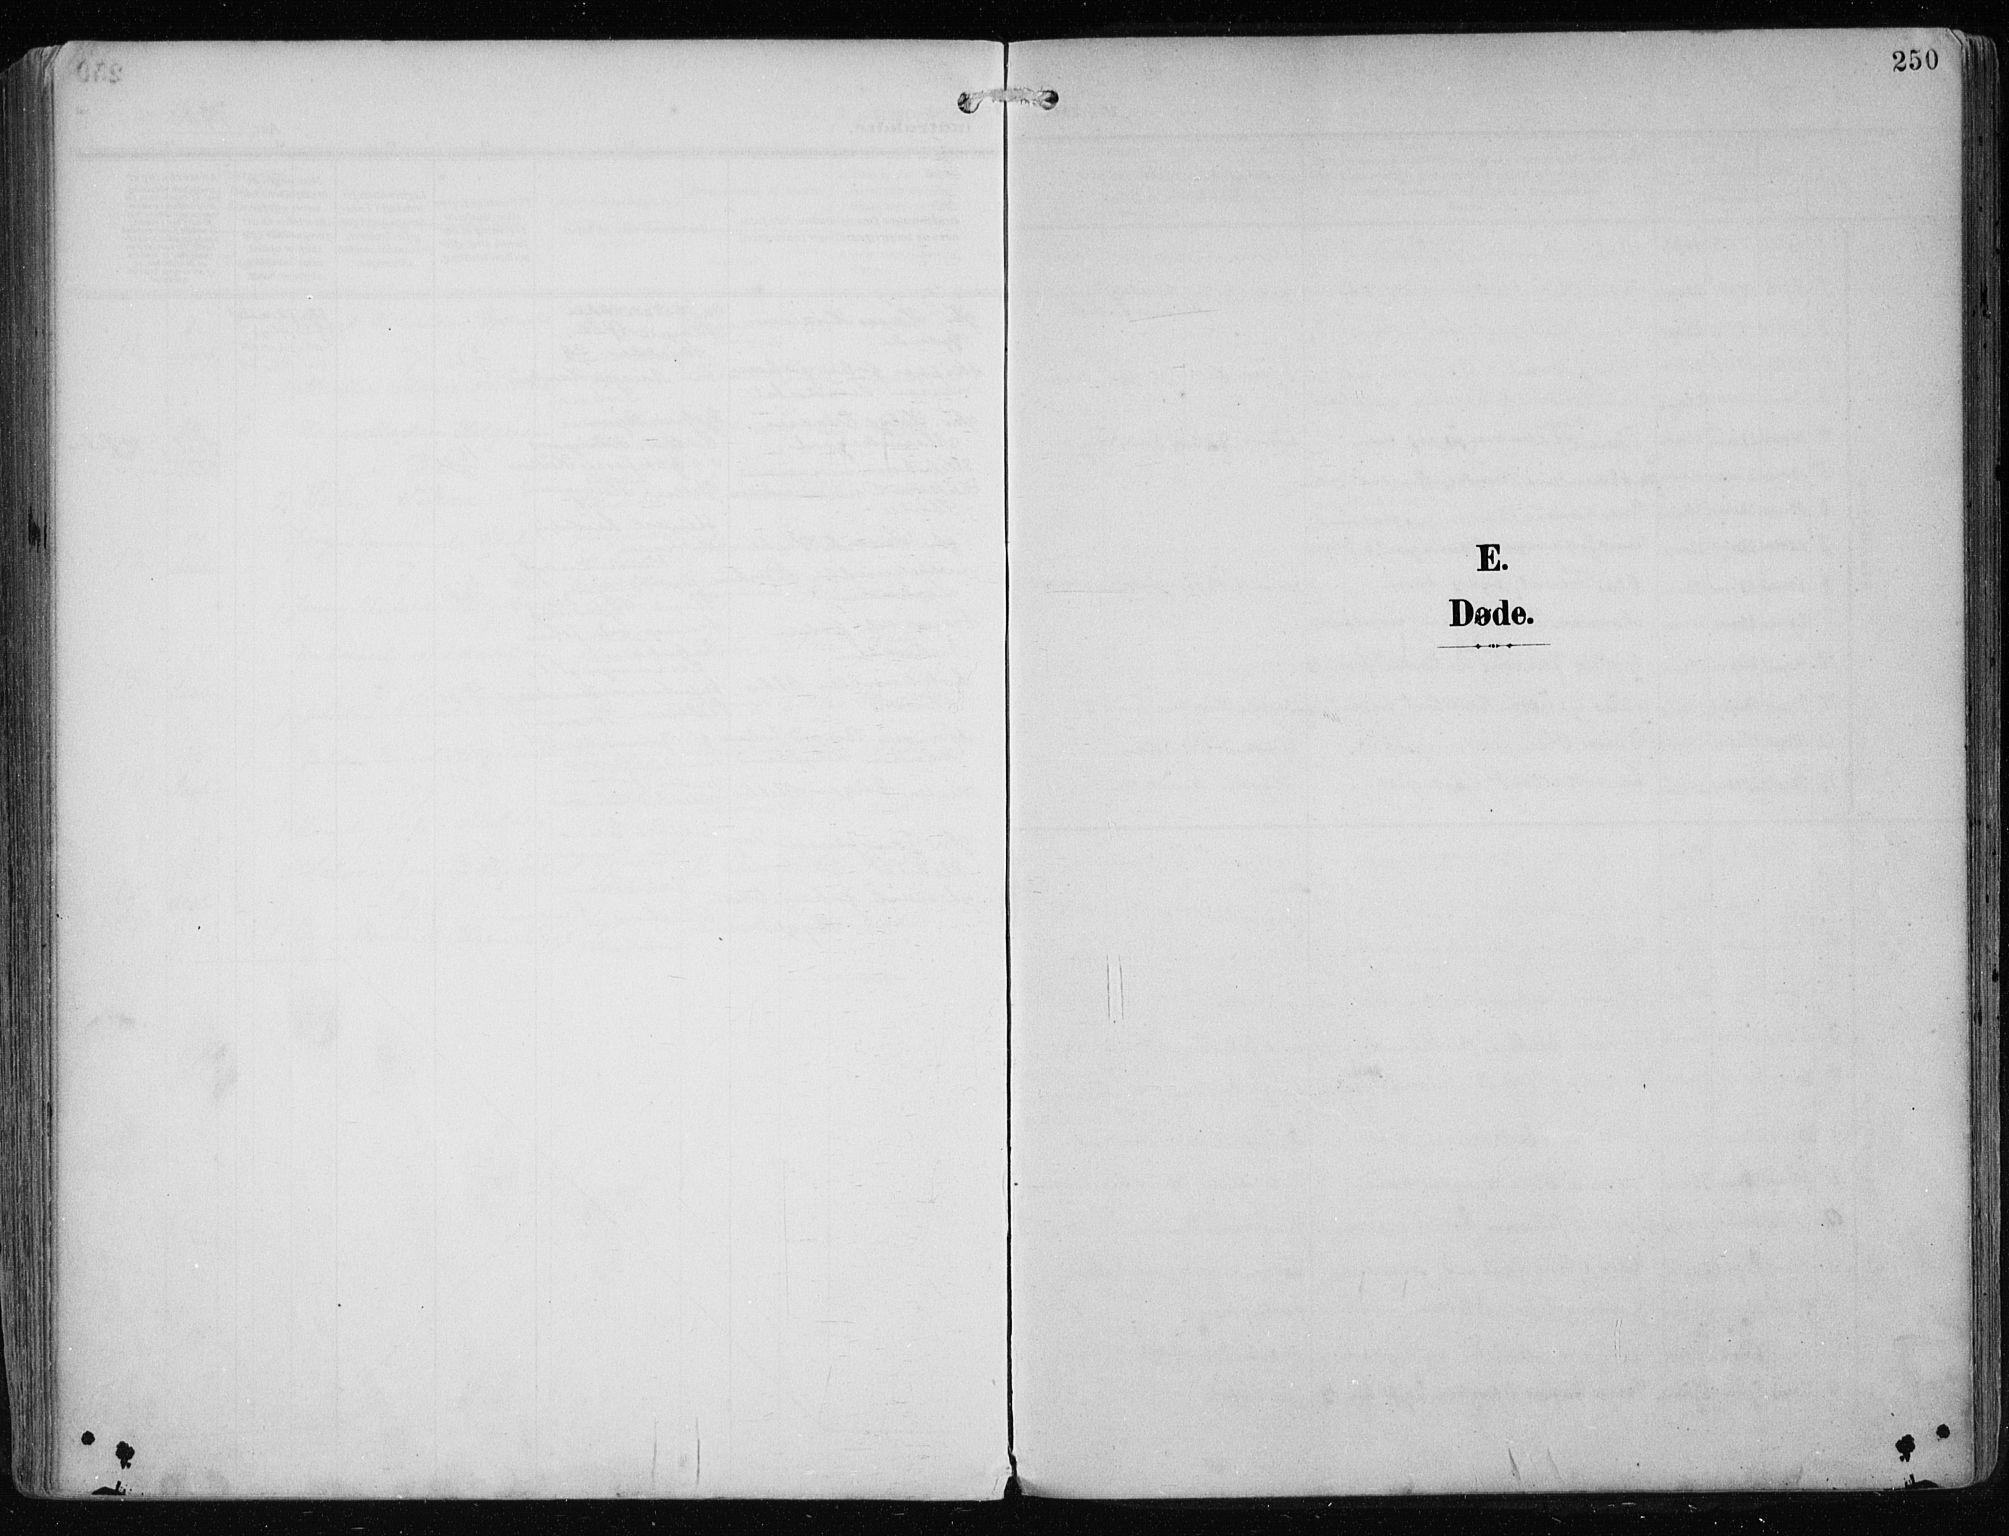 SAST, Haugesund sokneprestkontor, H/Ha/Haa/L0010: Ministerialbok nr. A 10, 1909-1935, s. 250